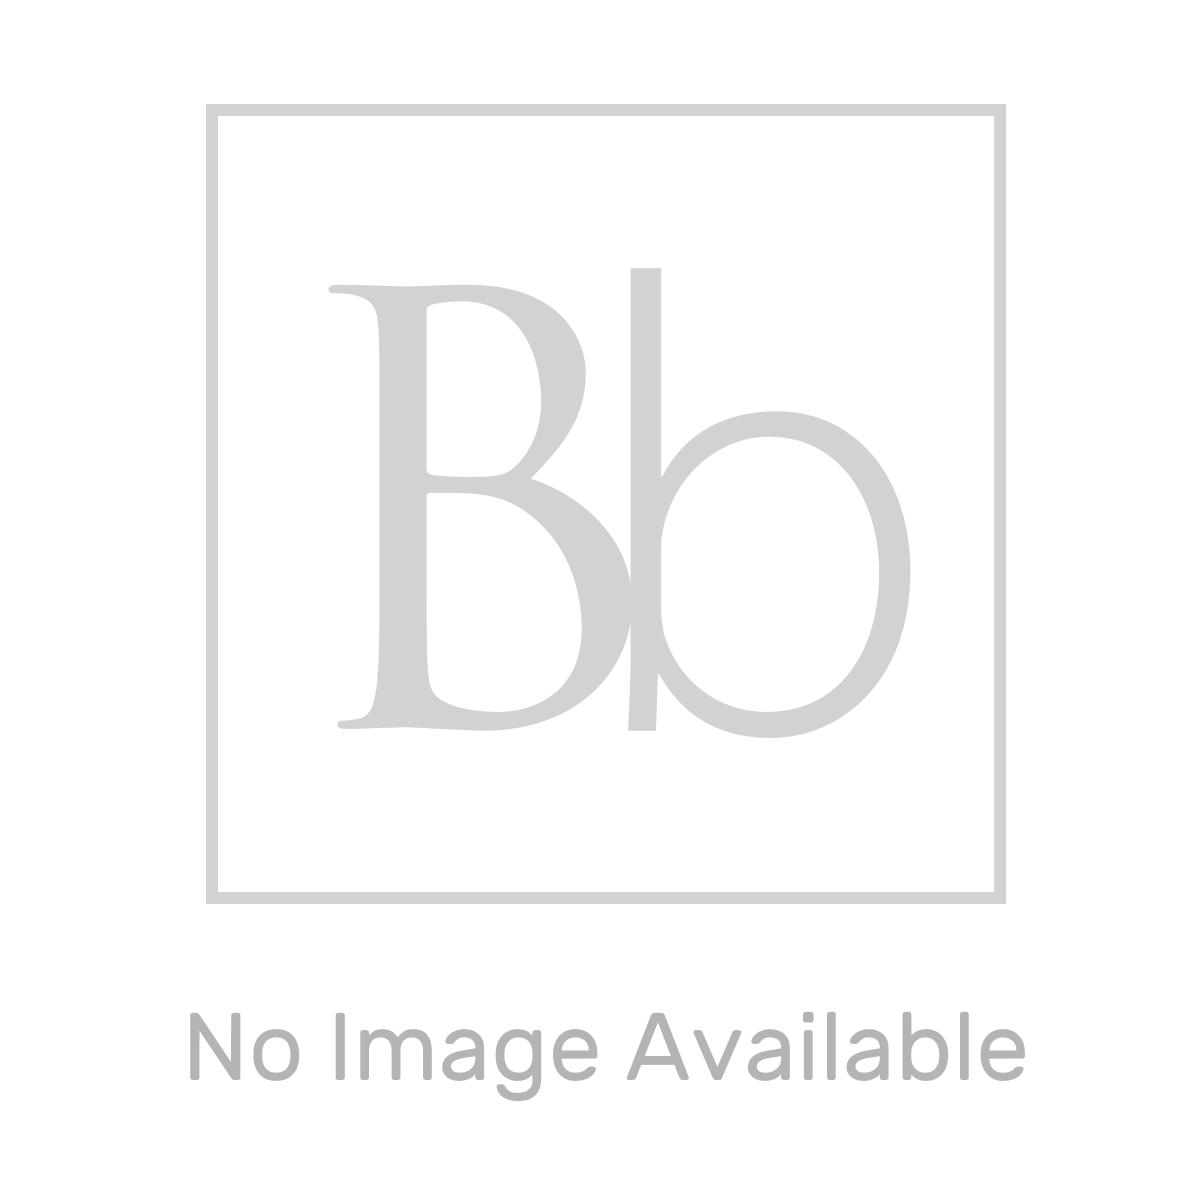 Hudson Reed Antique Brass Angled Thermostatic Radiator Valve and Lockshield